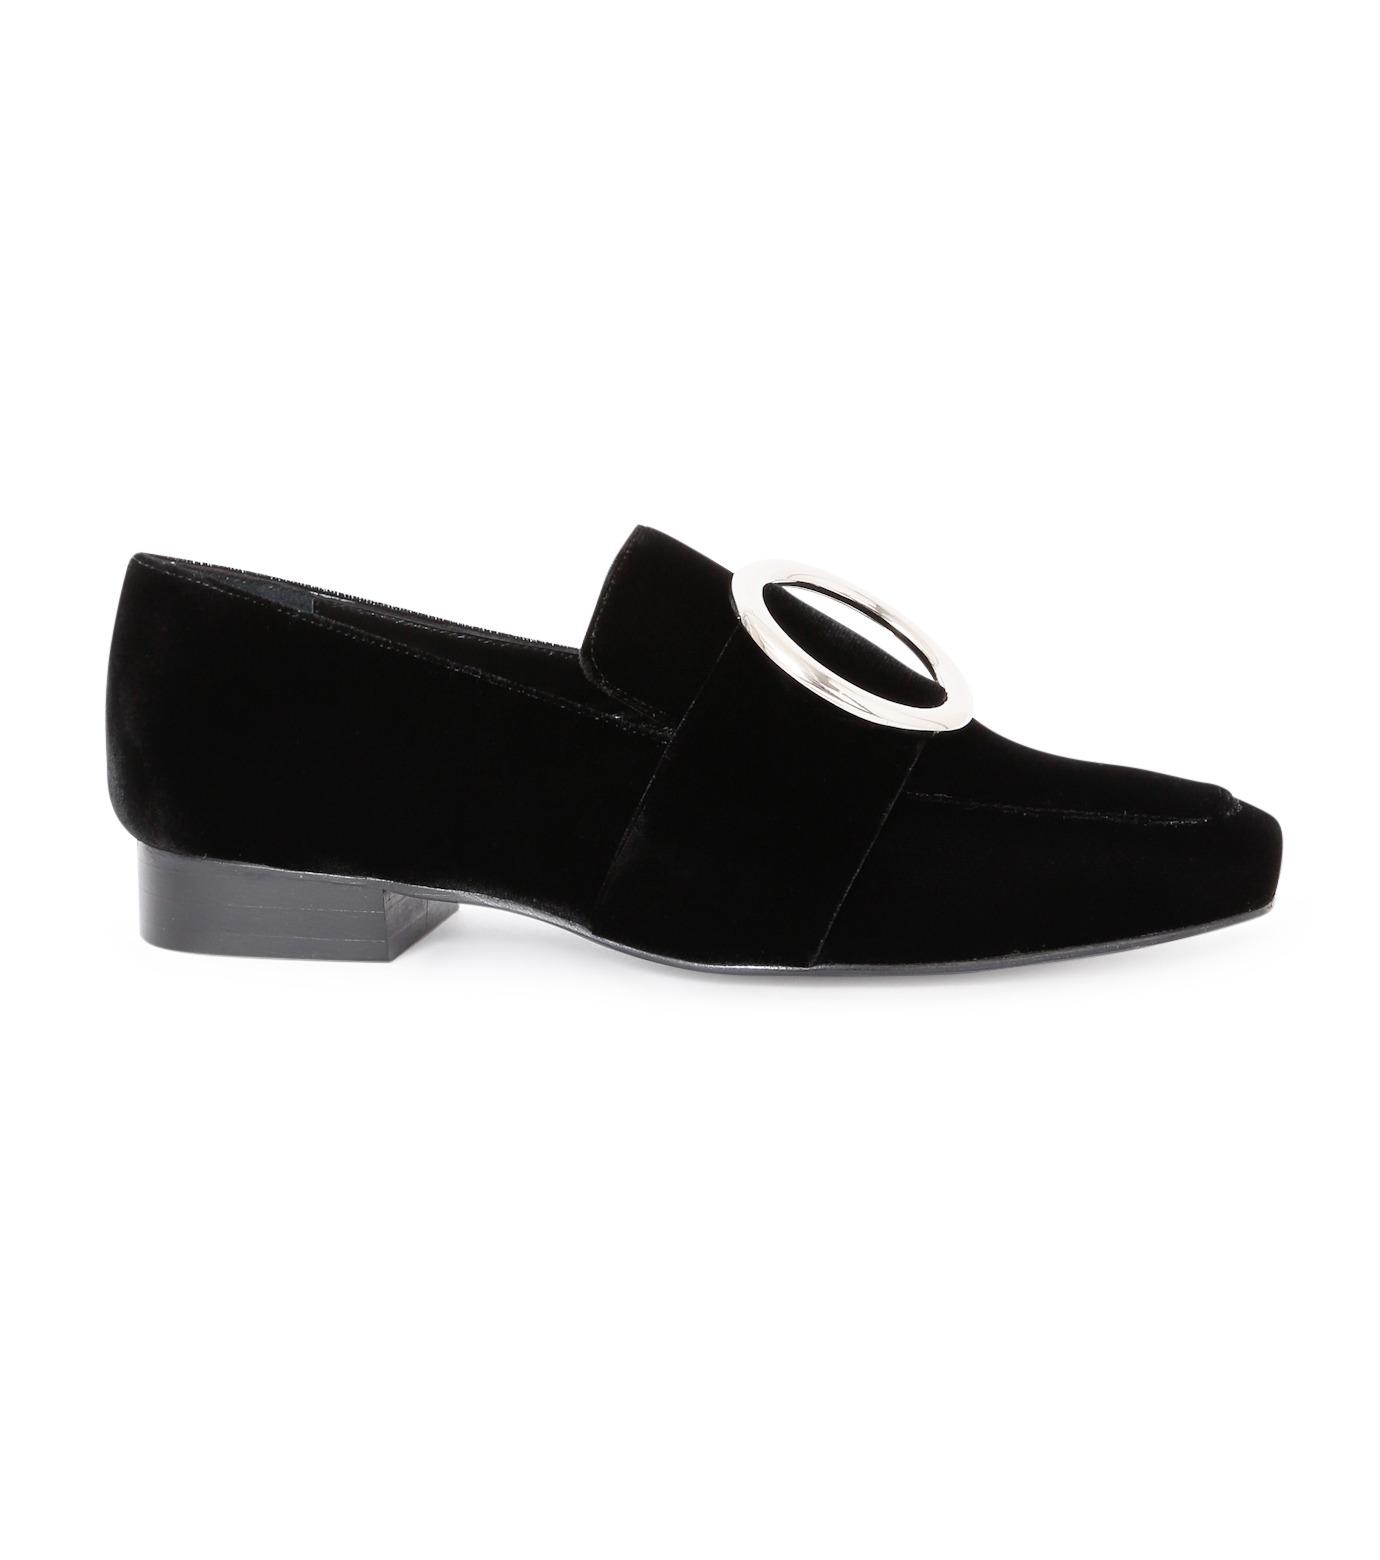 DORATEYMUR(ドラティムール)のRing Flat Shoes-BLACK(フラットシューズ/Flat shoes)-HARPUT-L-13 拡大詳細画像1